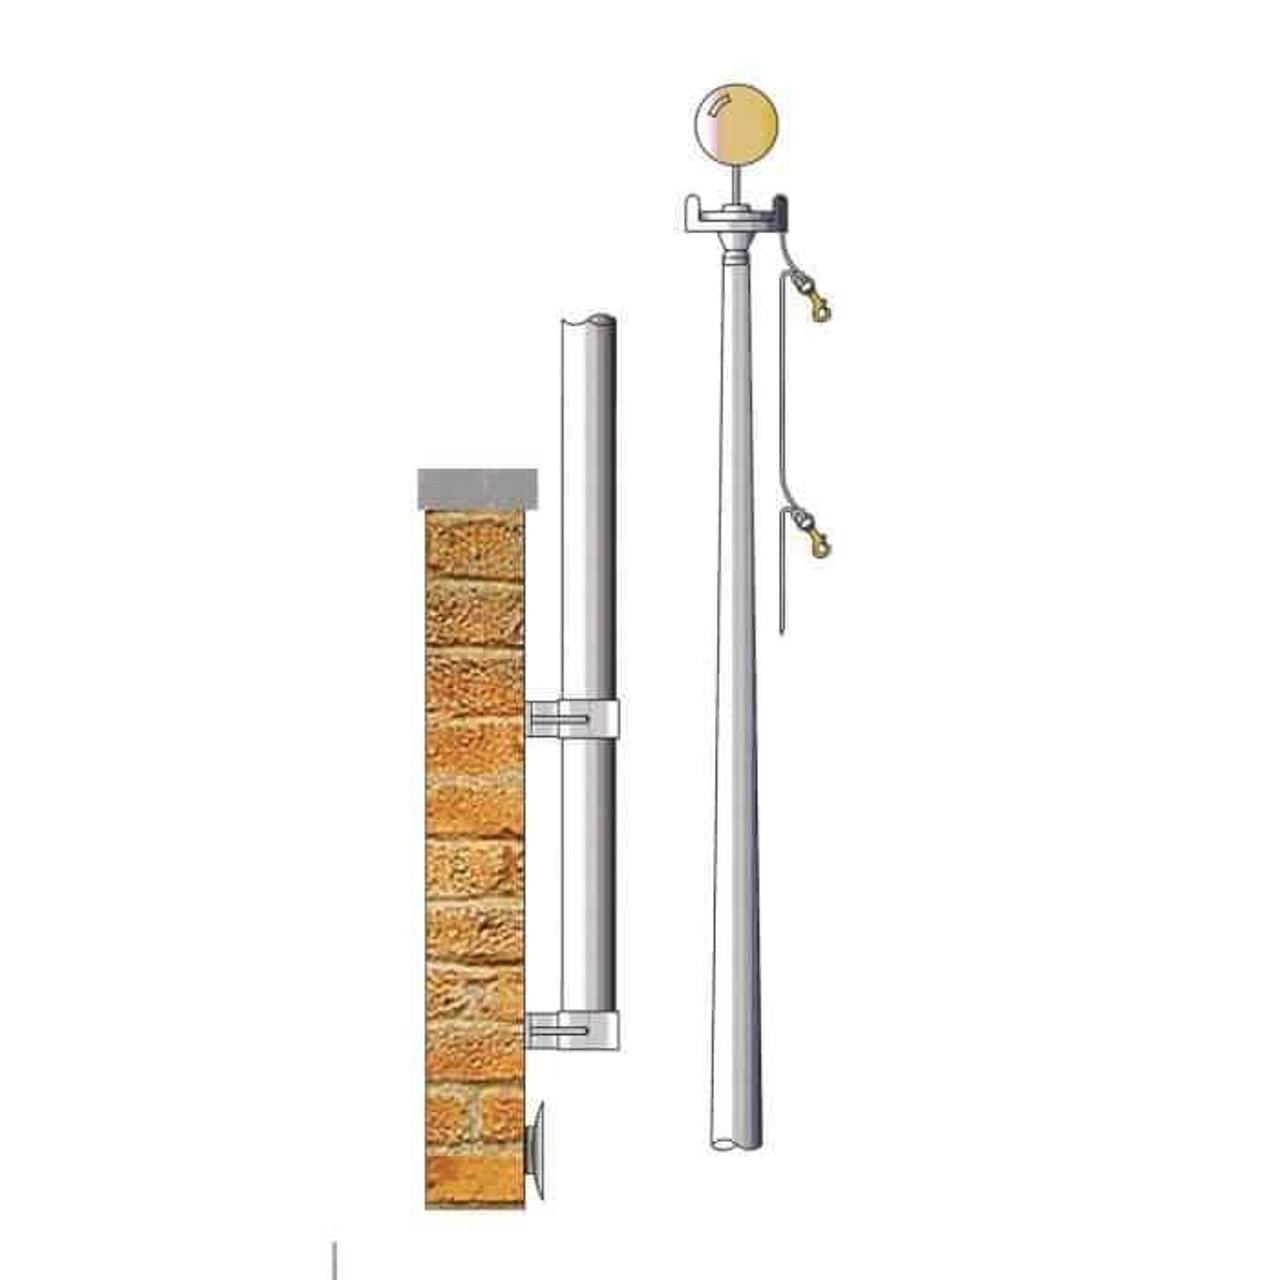 12 Vertical Wall Mounted Flagpole EVWM12